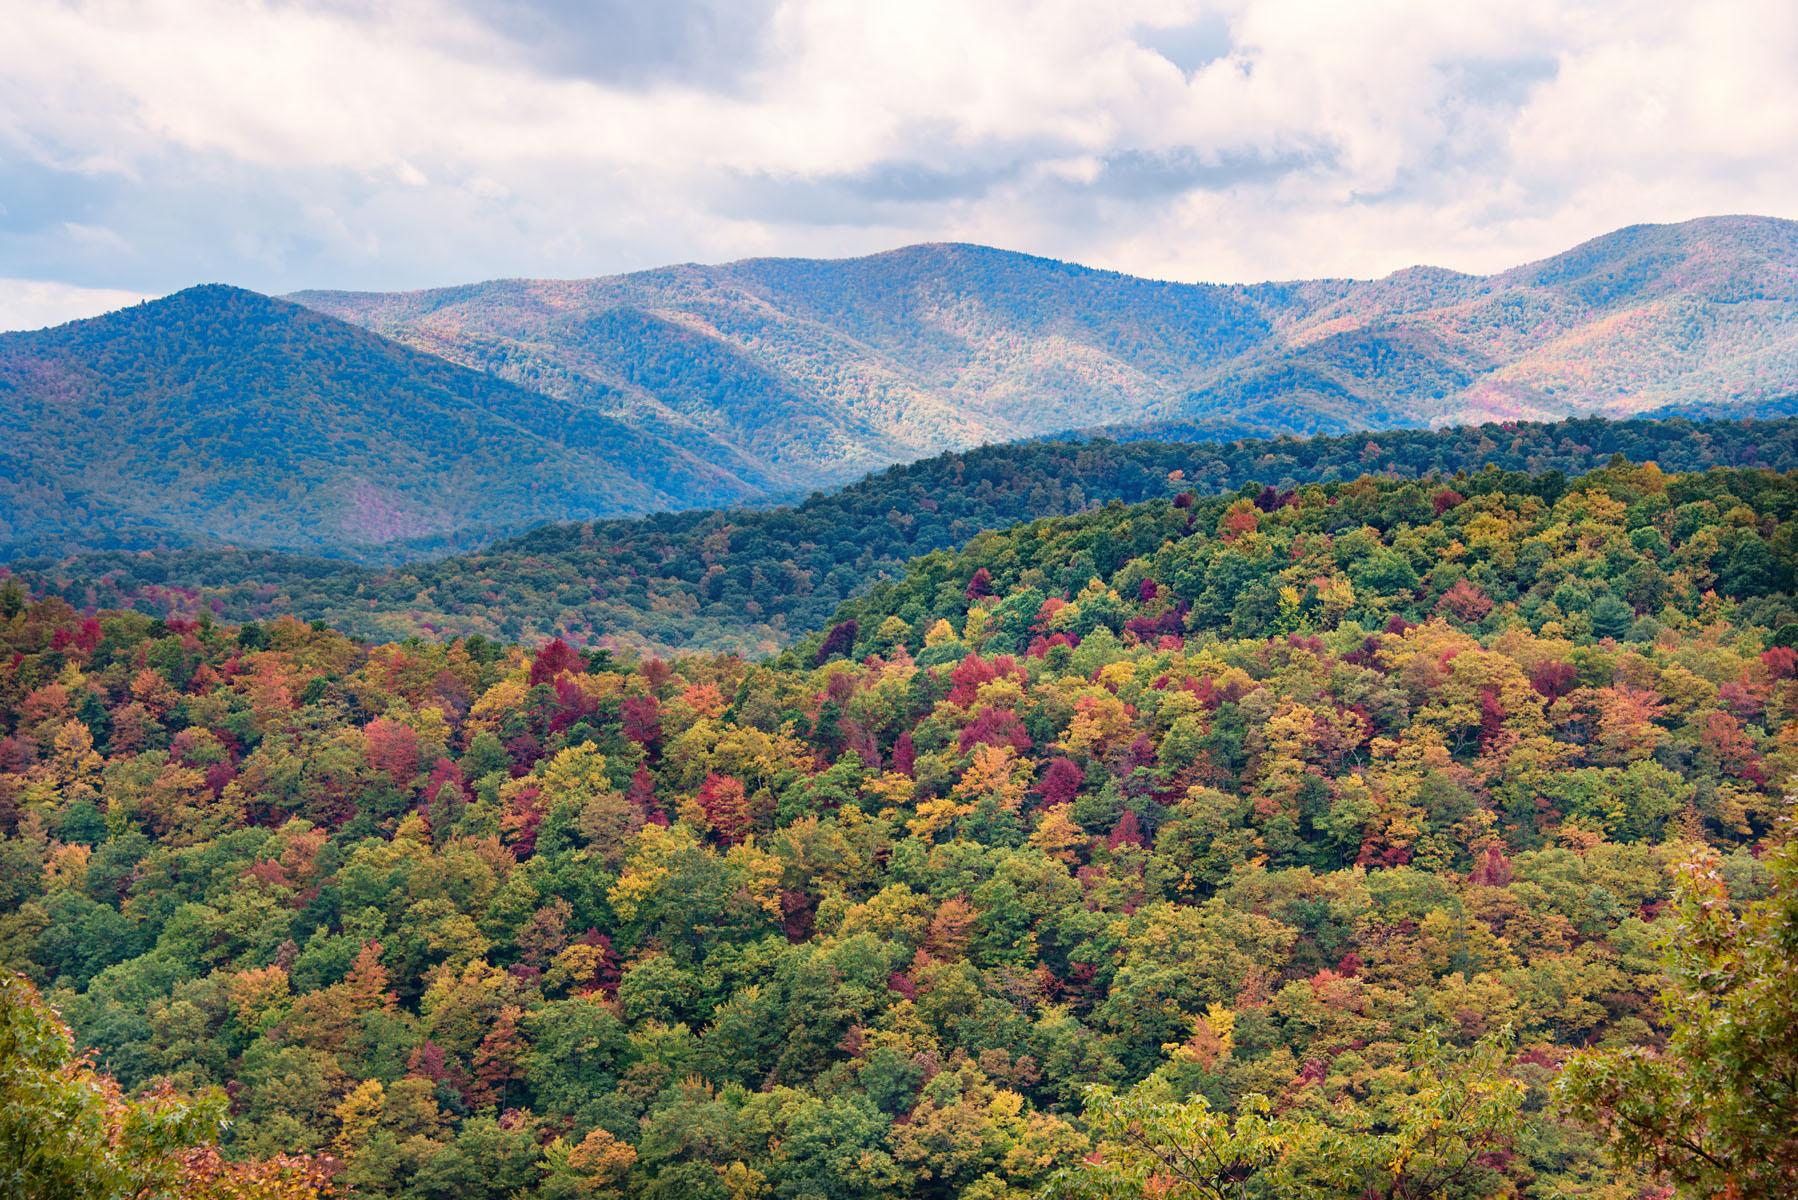 Fall Foliage in Smoky Mountains on Blue Ridge Parkway